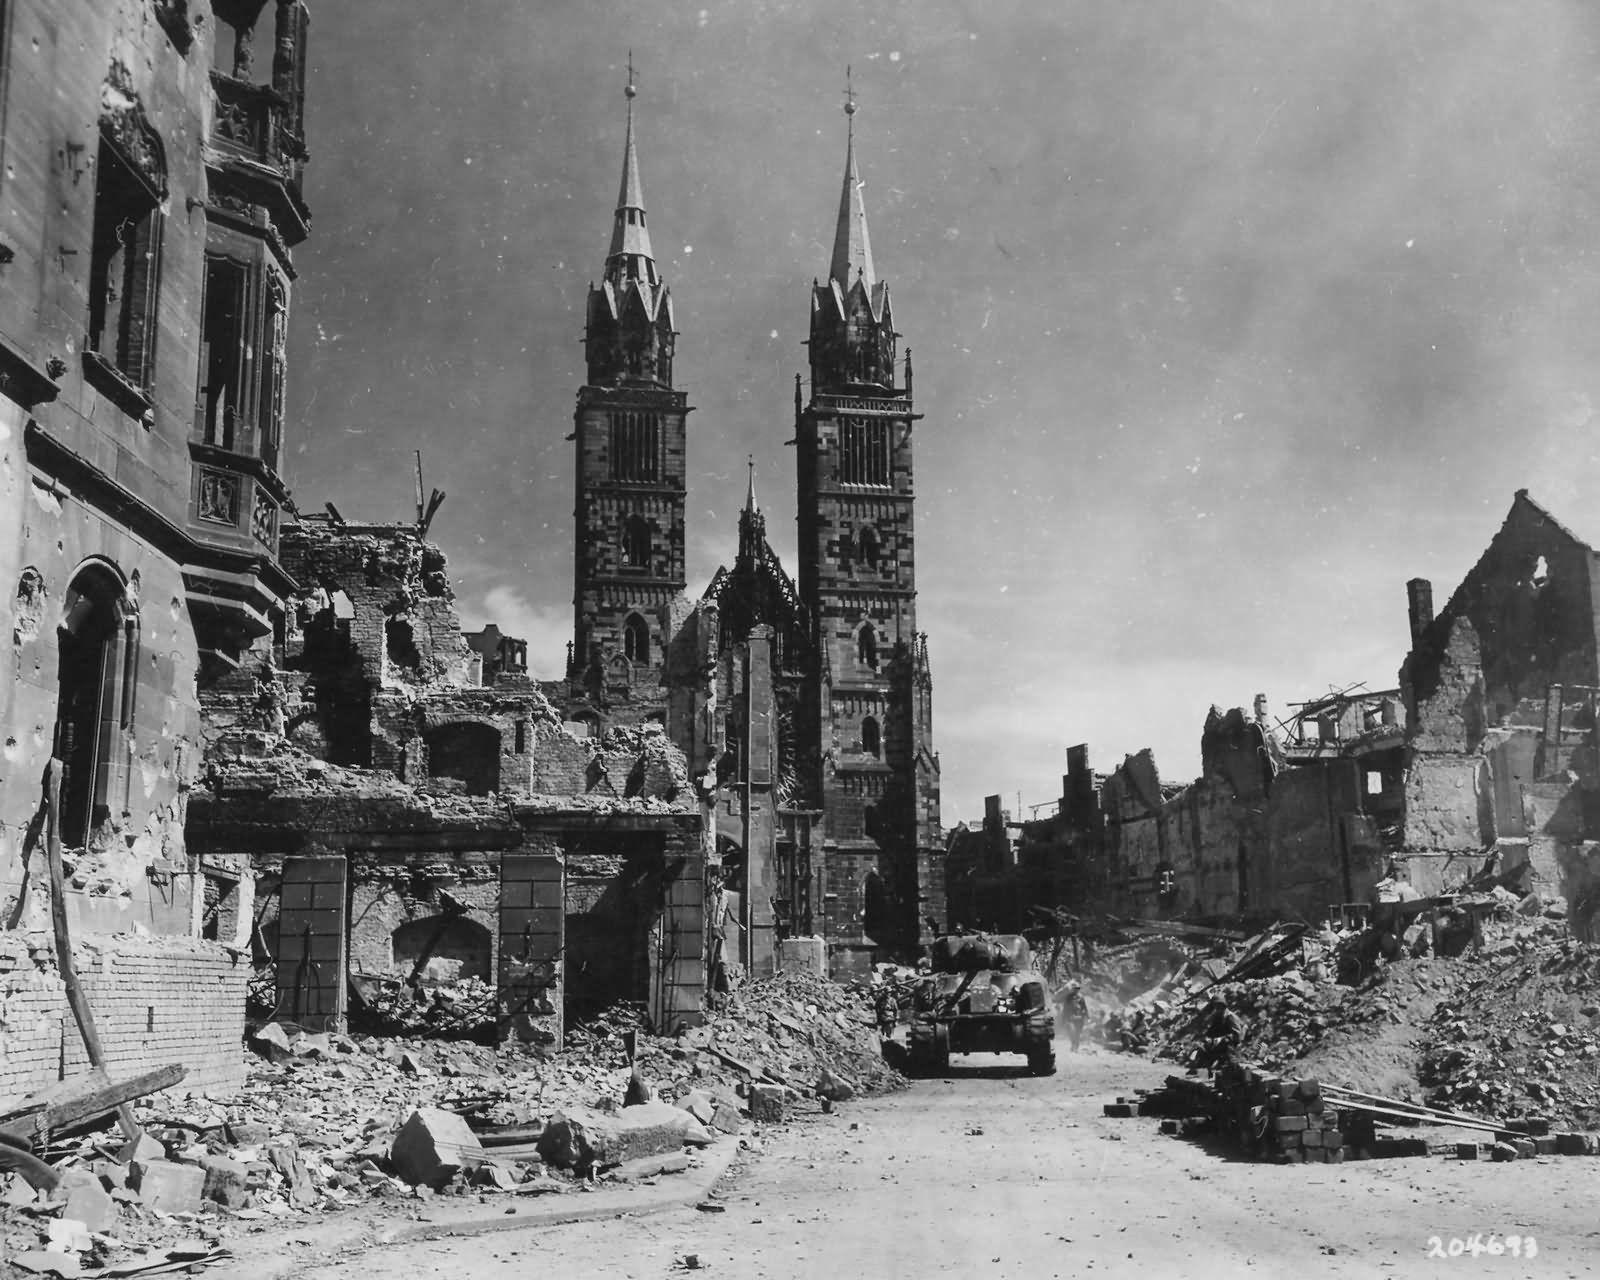 45th Infantry Division Troops And M4 Sherman Fighting In Nurnberg Nuremberg Germany 1945 Nurnberg Nachkriegszeit Bilder